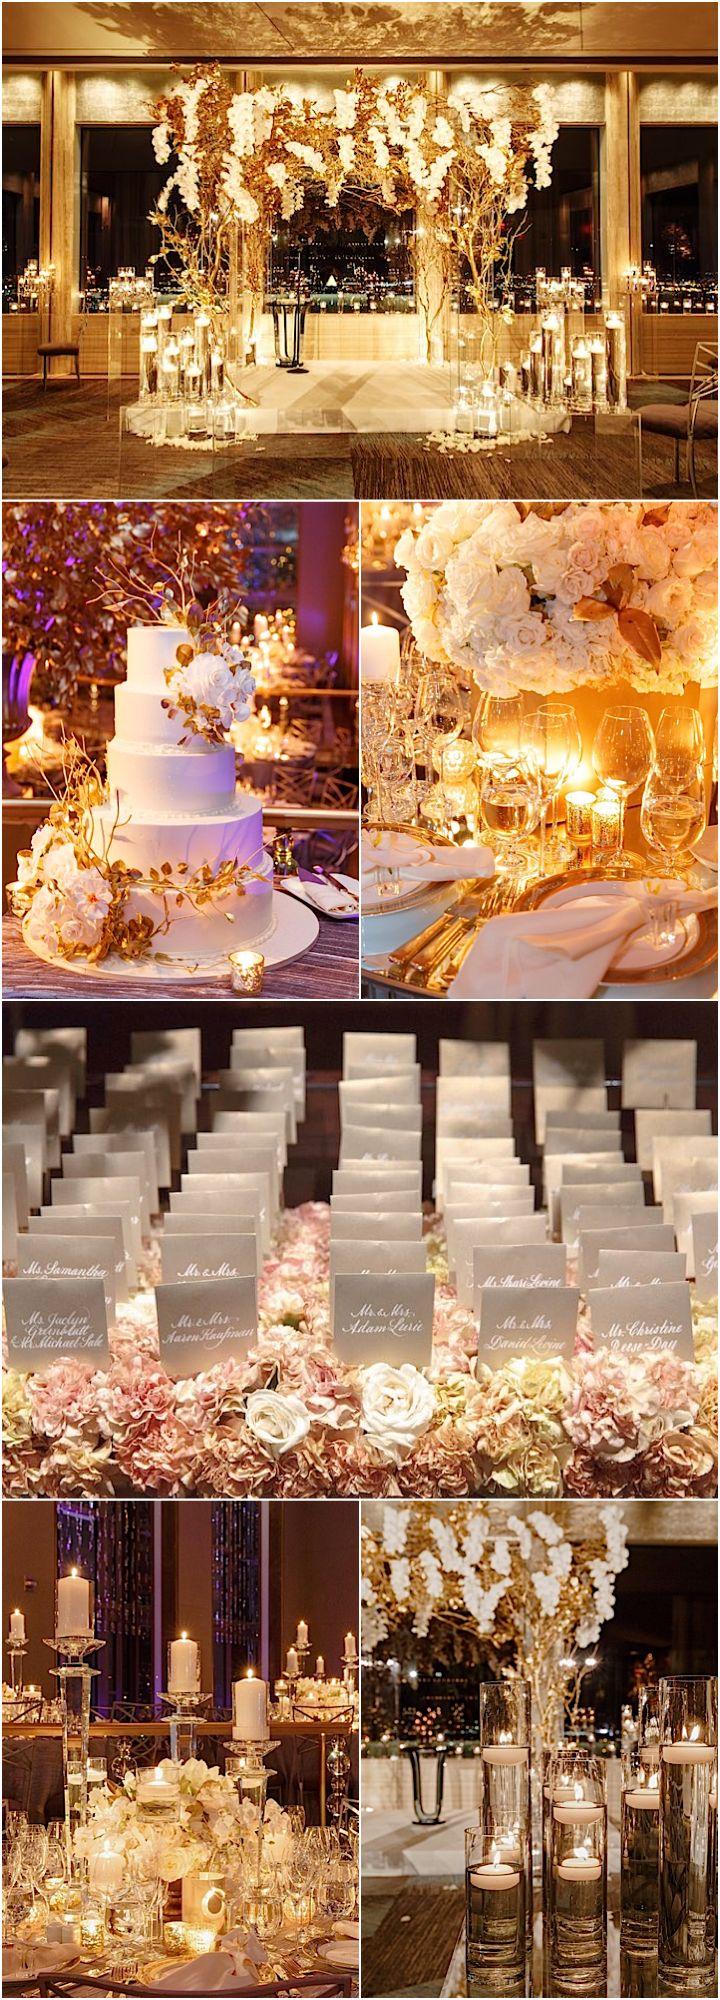 Featured Photographer: Lilian Haidar Photography; ballroom wedding ideas